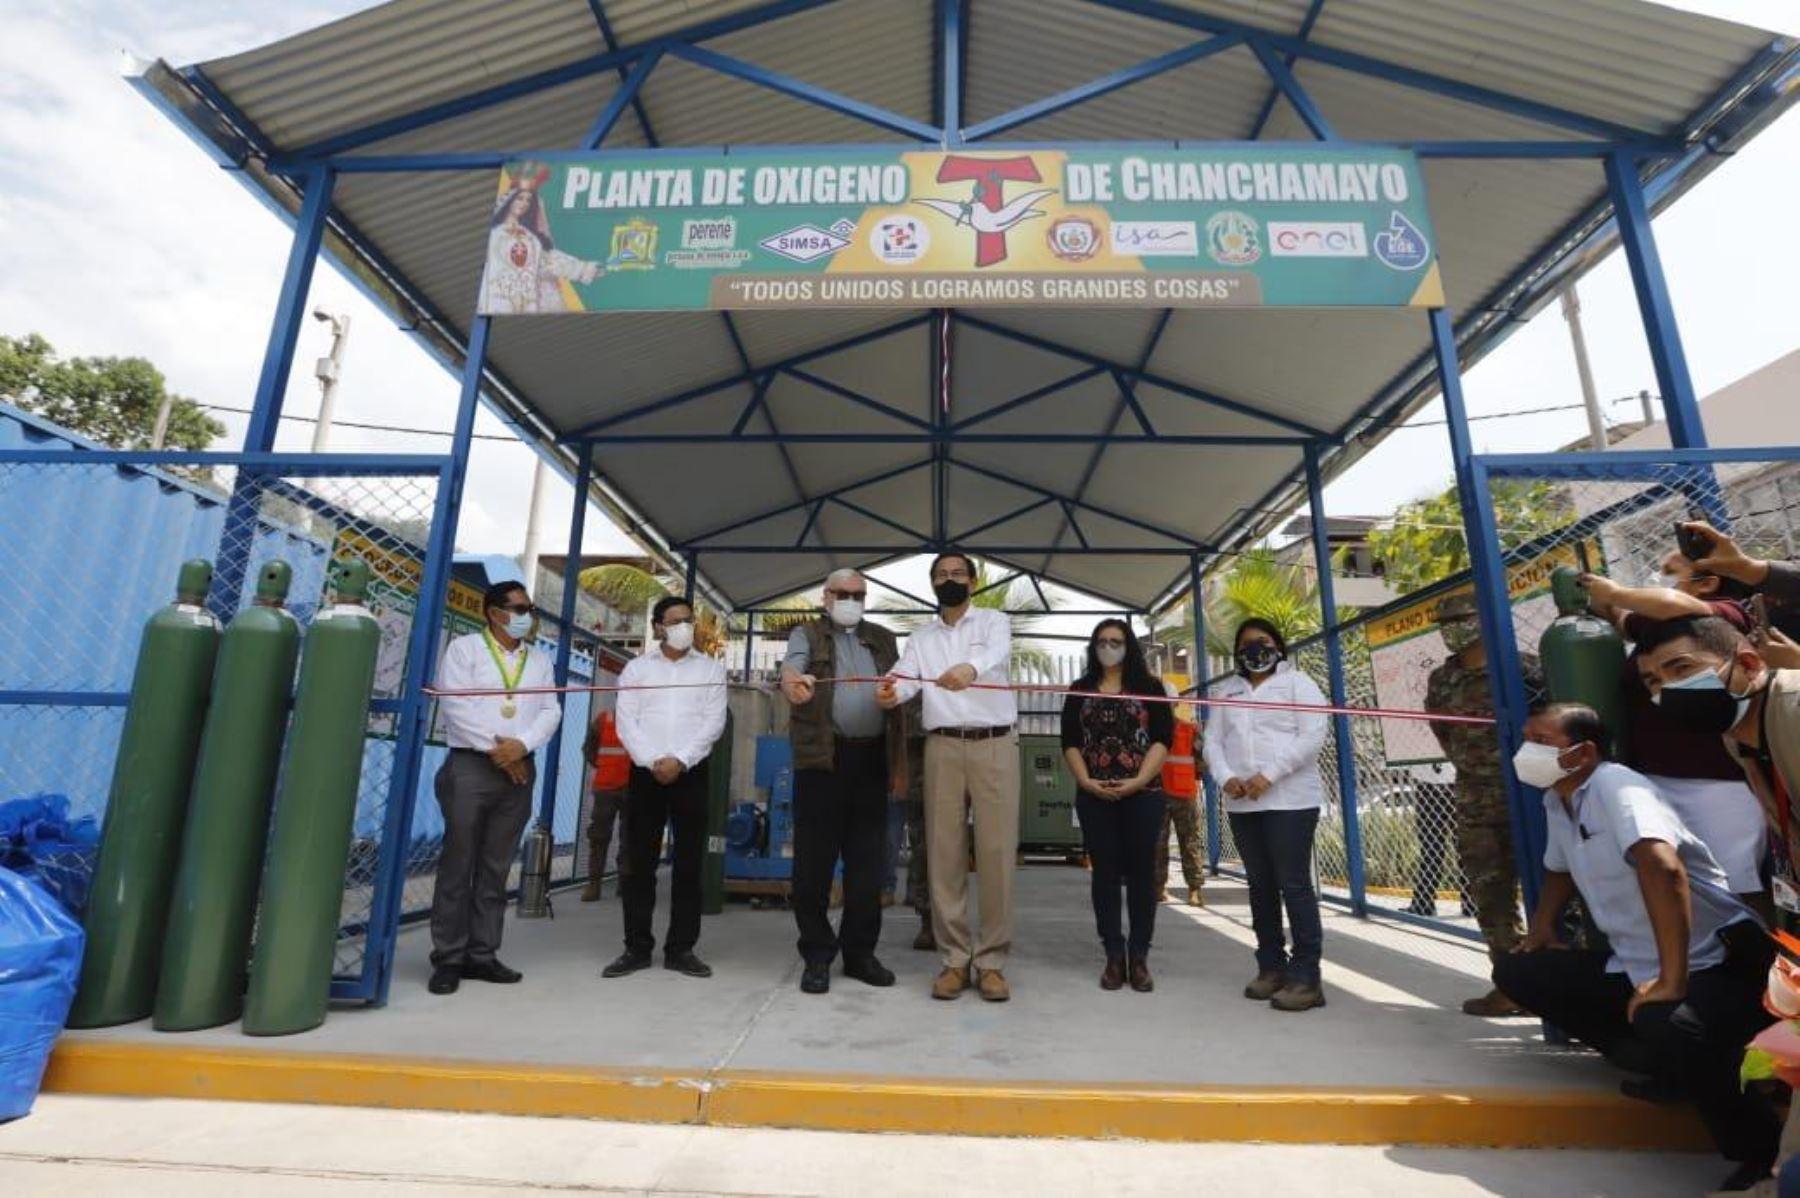 Peruvian President Martin Vizcarra inaugurates oxygen plant in Chanchamayo. Photo: ANDINA/Presidency of the Republic